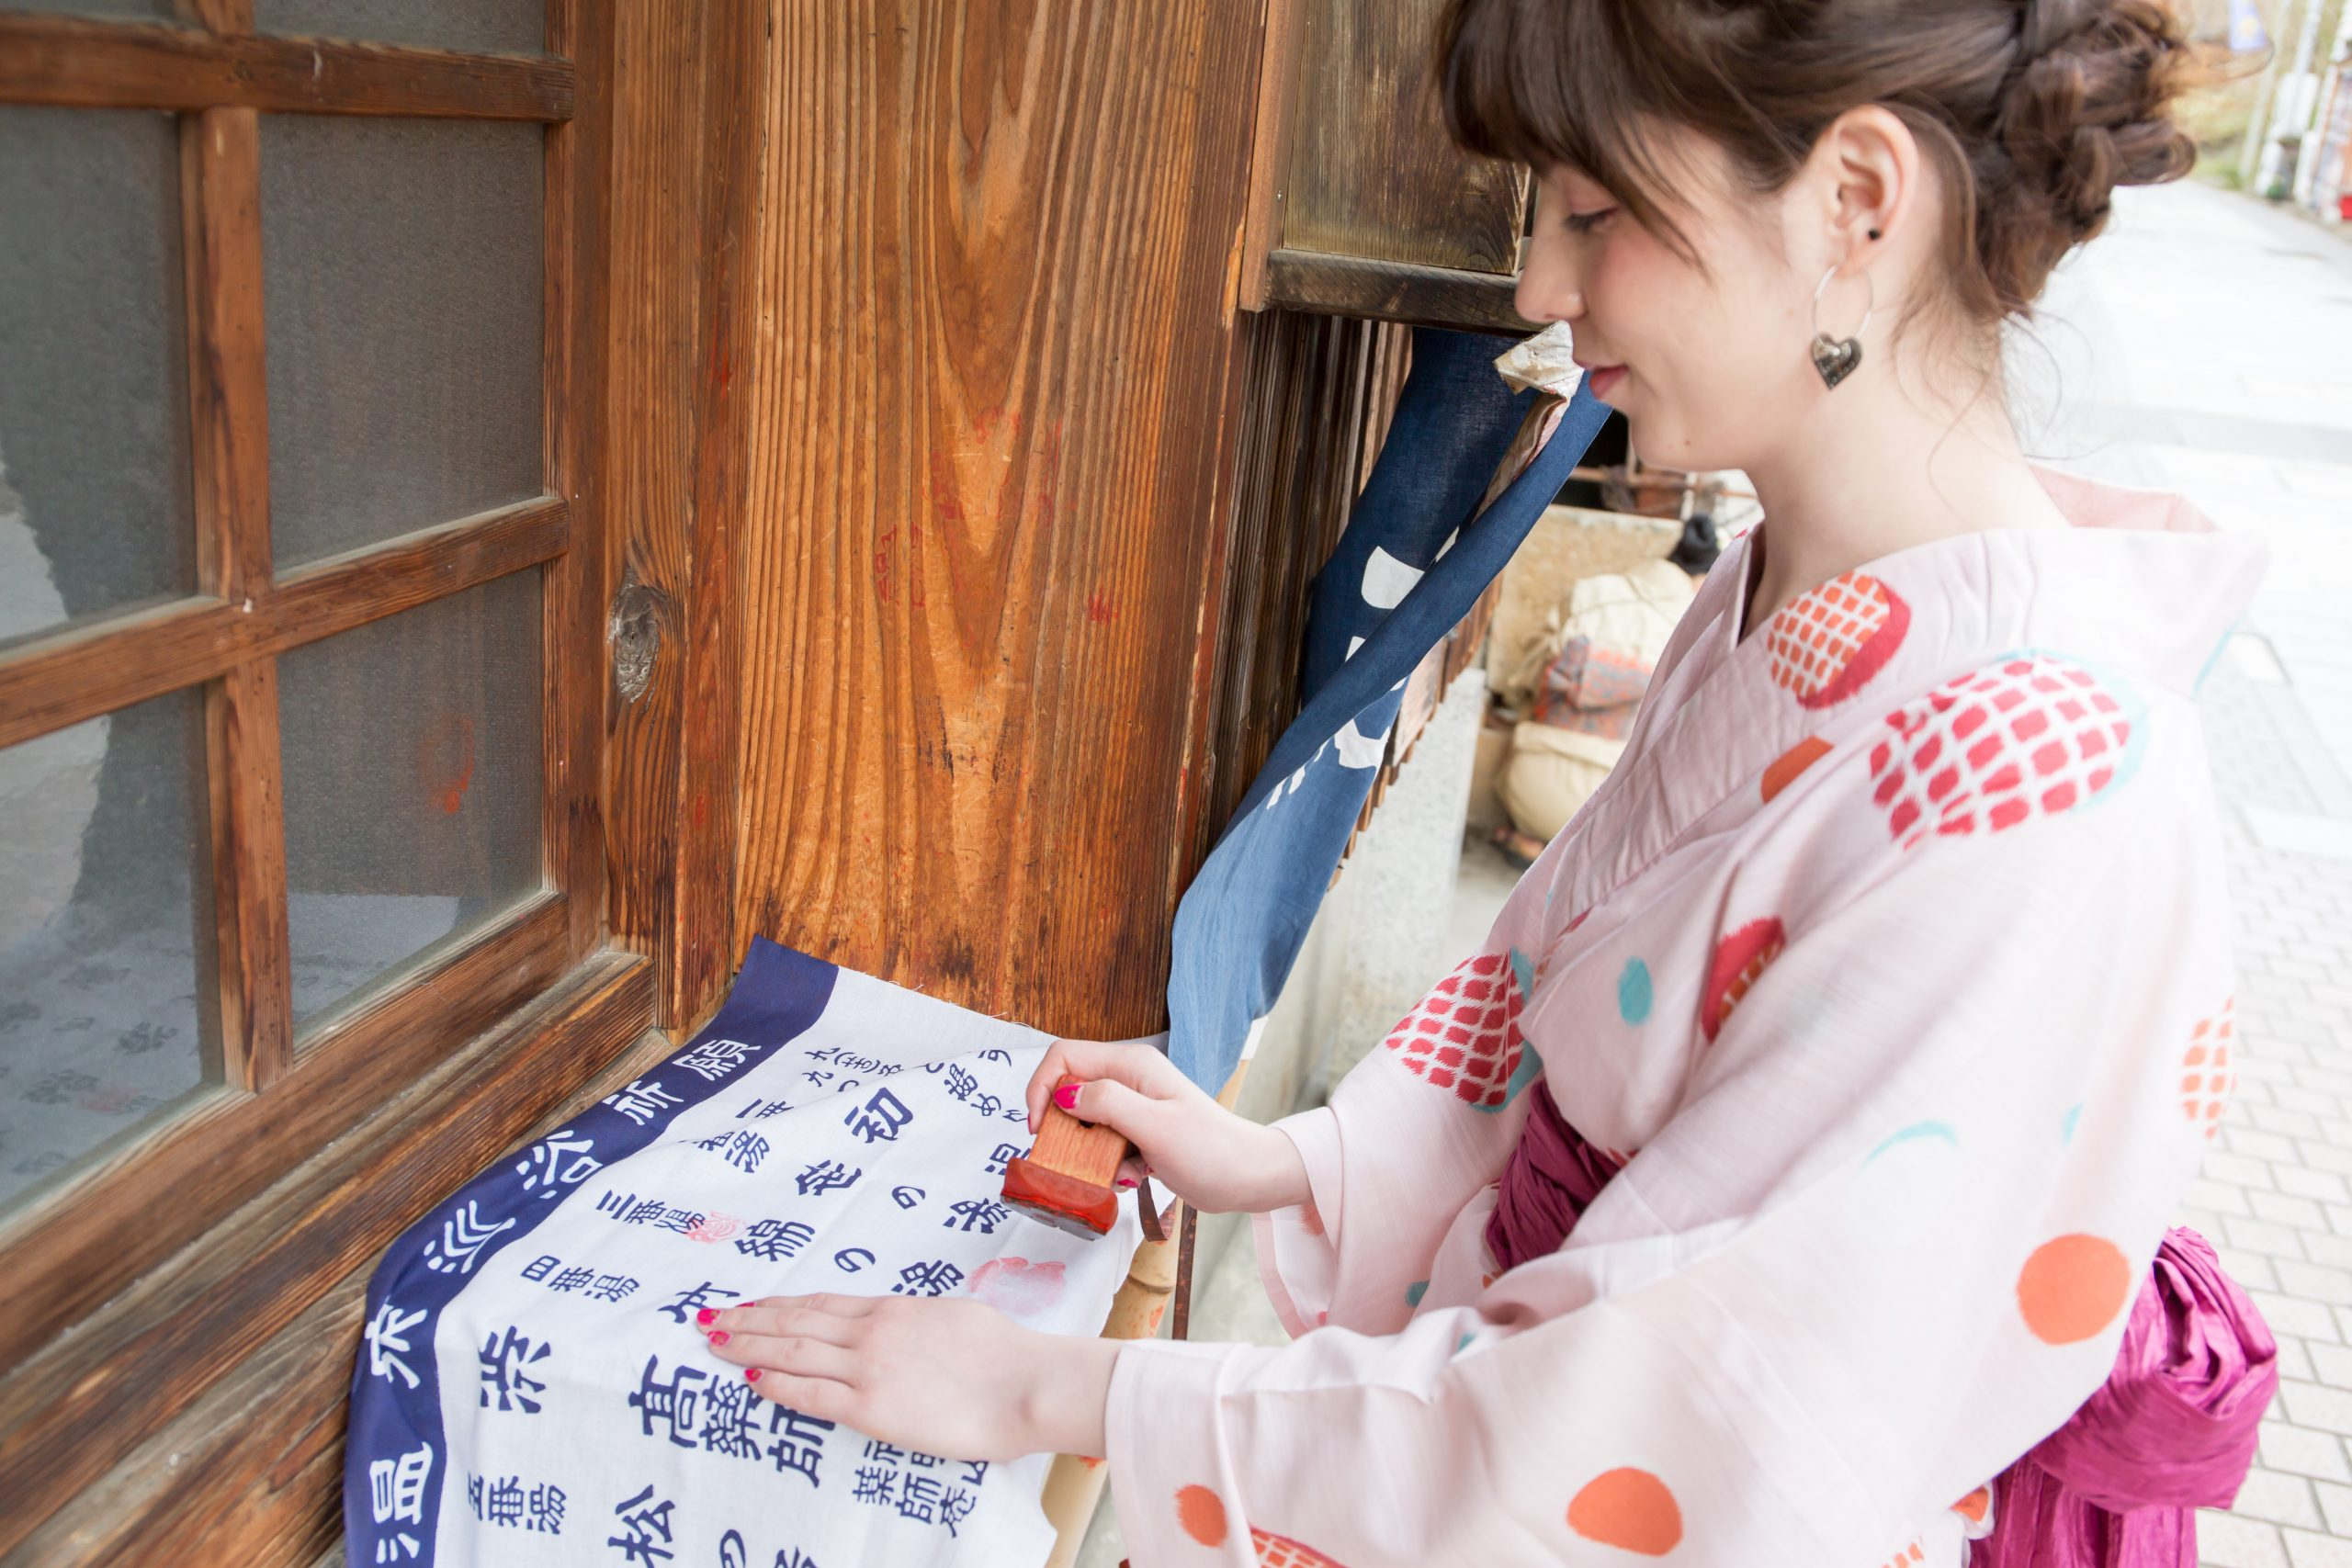 Activities in Yudanaka Onsen & Shibu Onsen